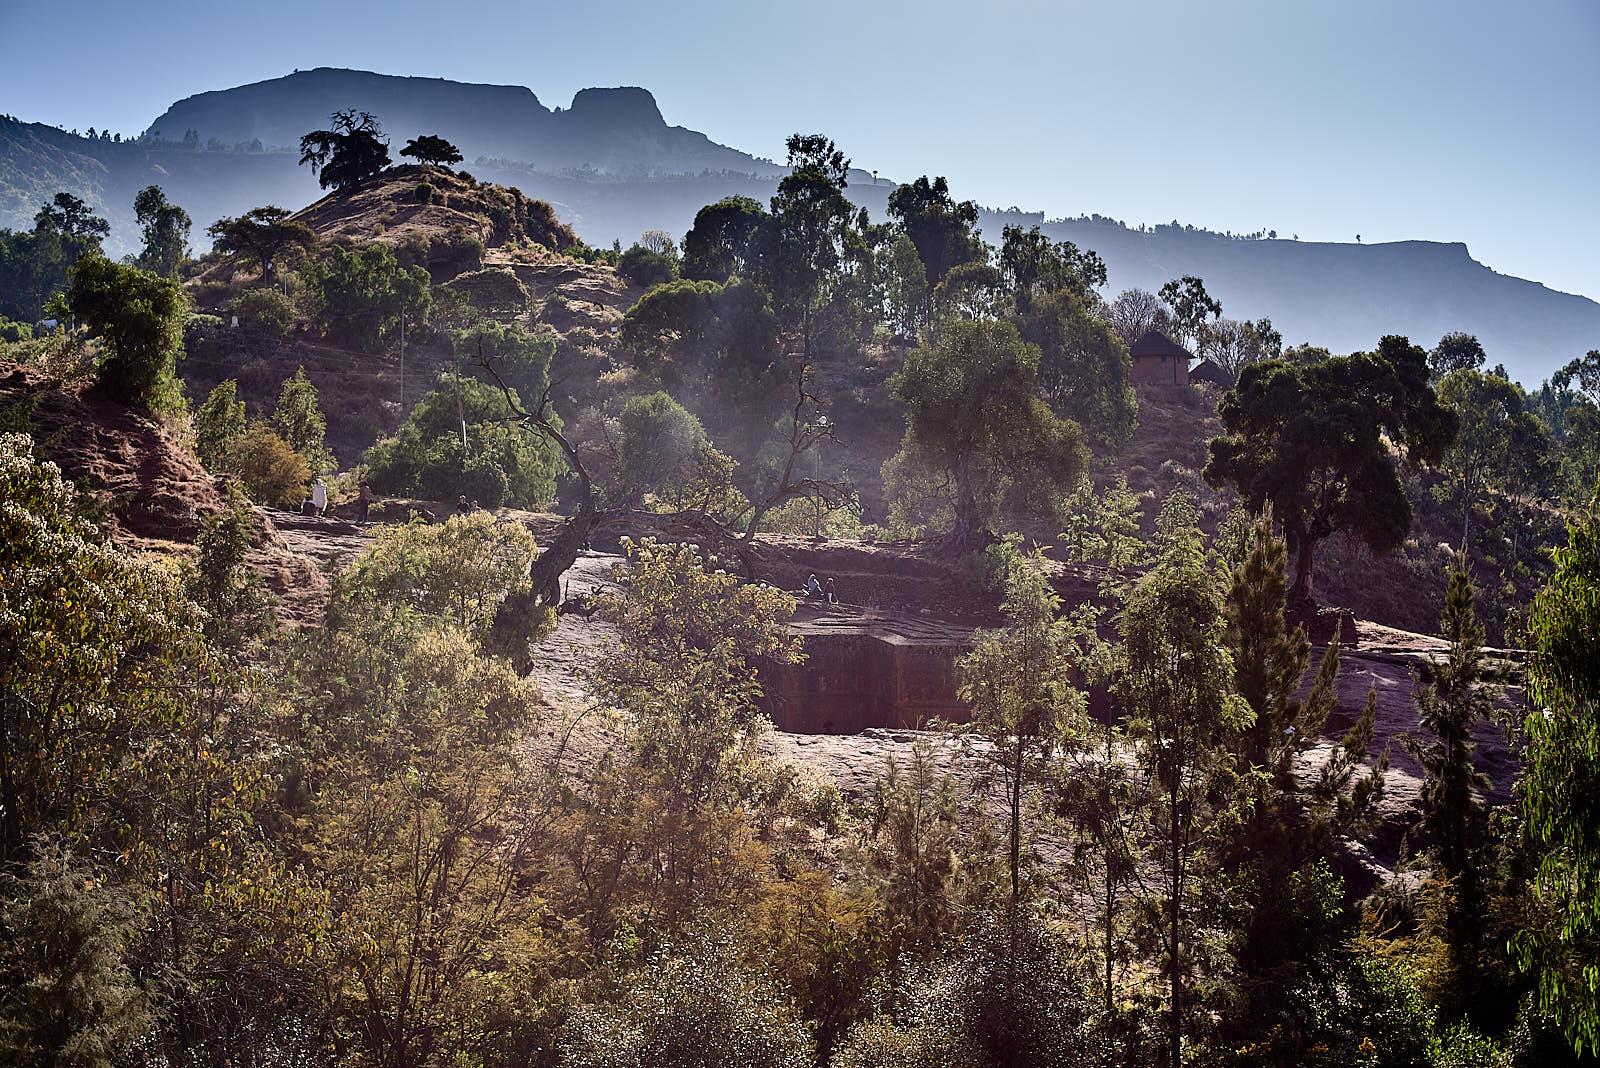 Tucked into the landscape, the Church of Saint George, Lalibela, Ethiopia.